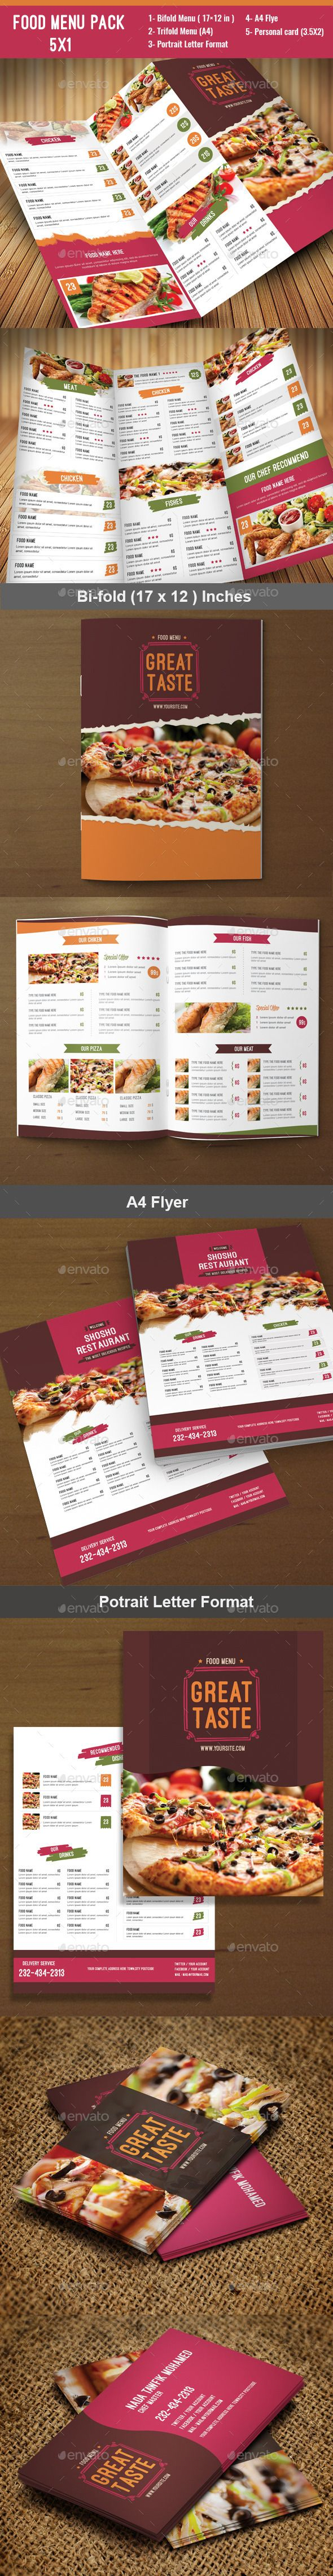 Food Menu Pack 7 | Branding y Inspiración